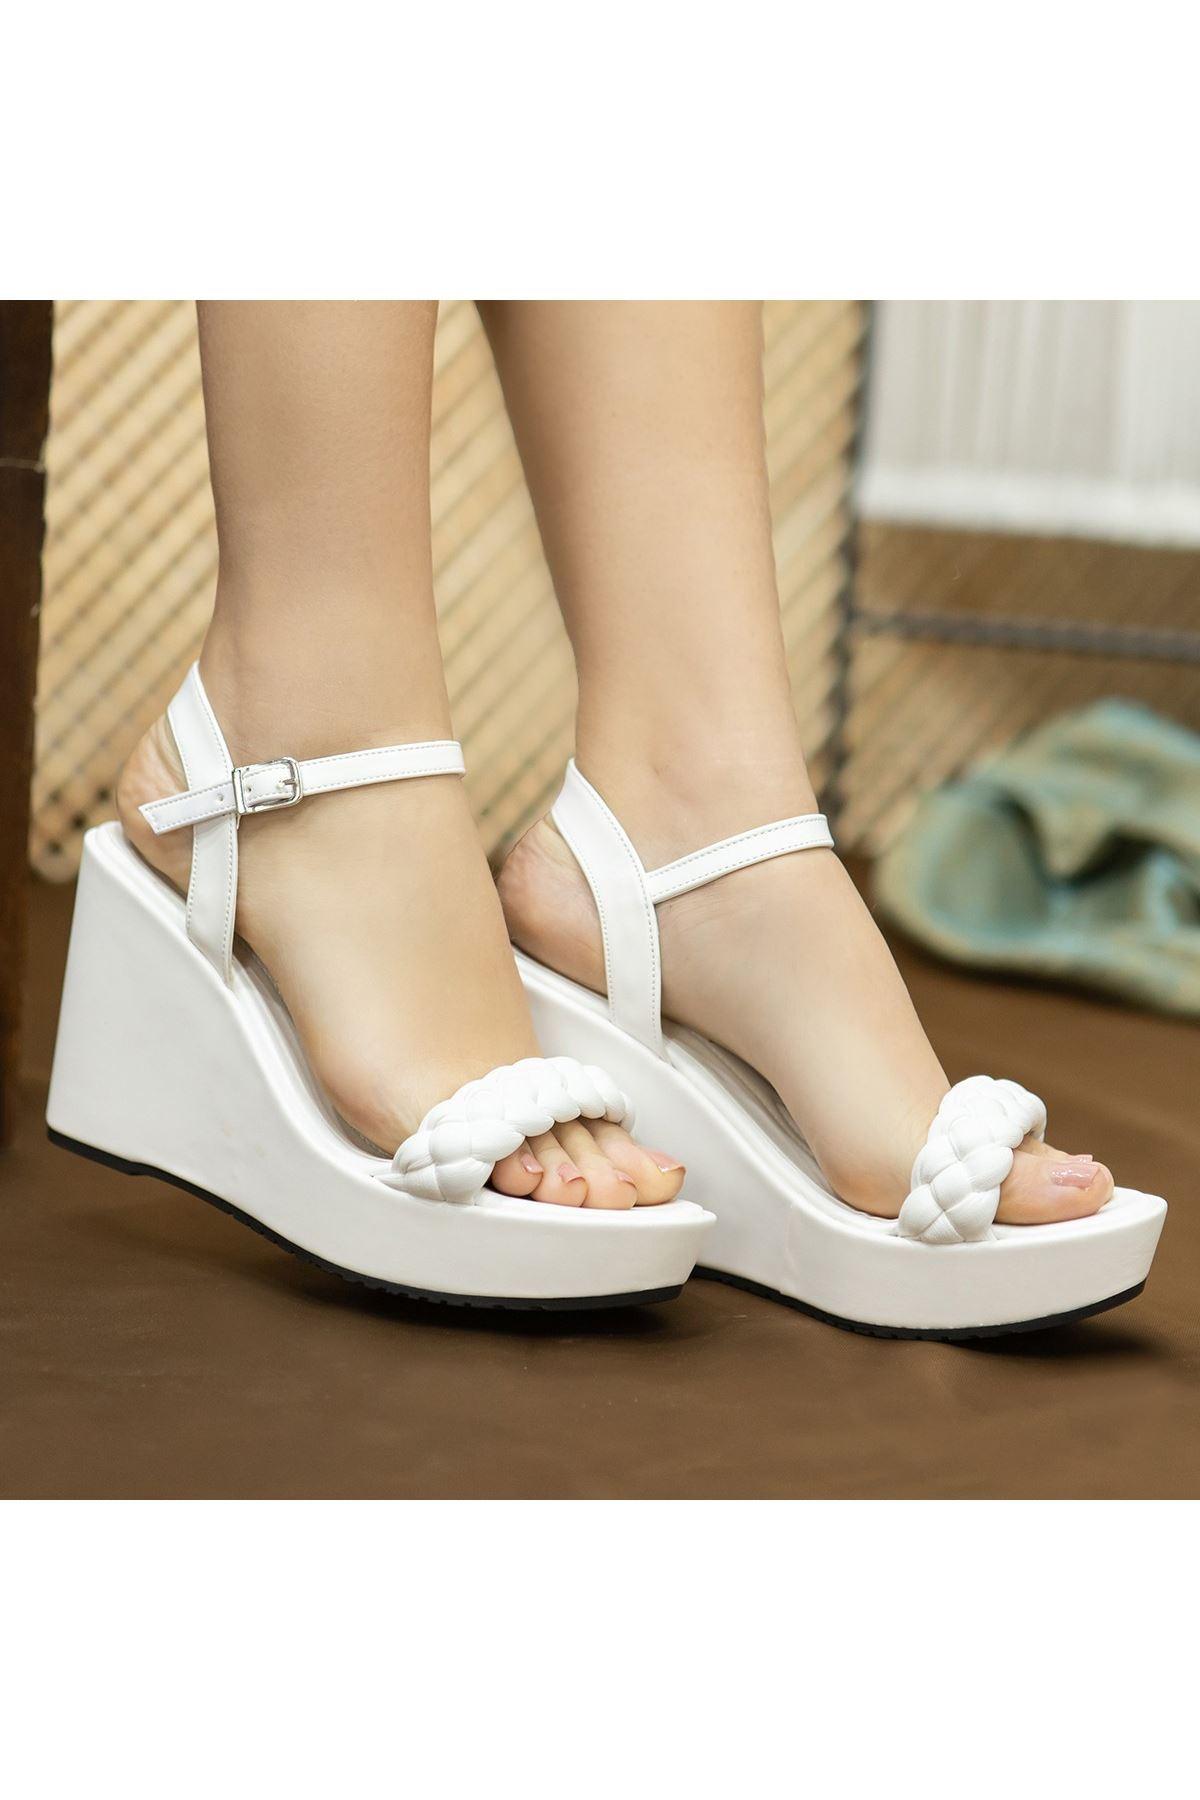 Fant Beyaz Cilt Dolgu Topuk Sandalet